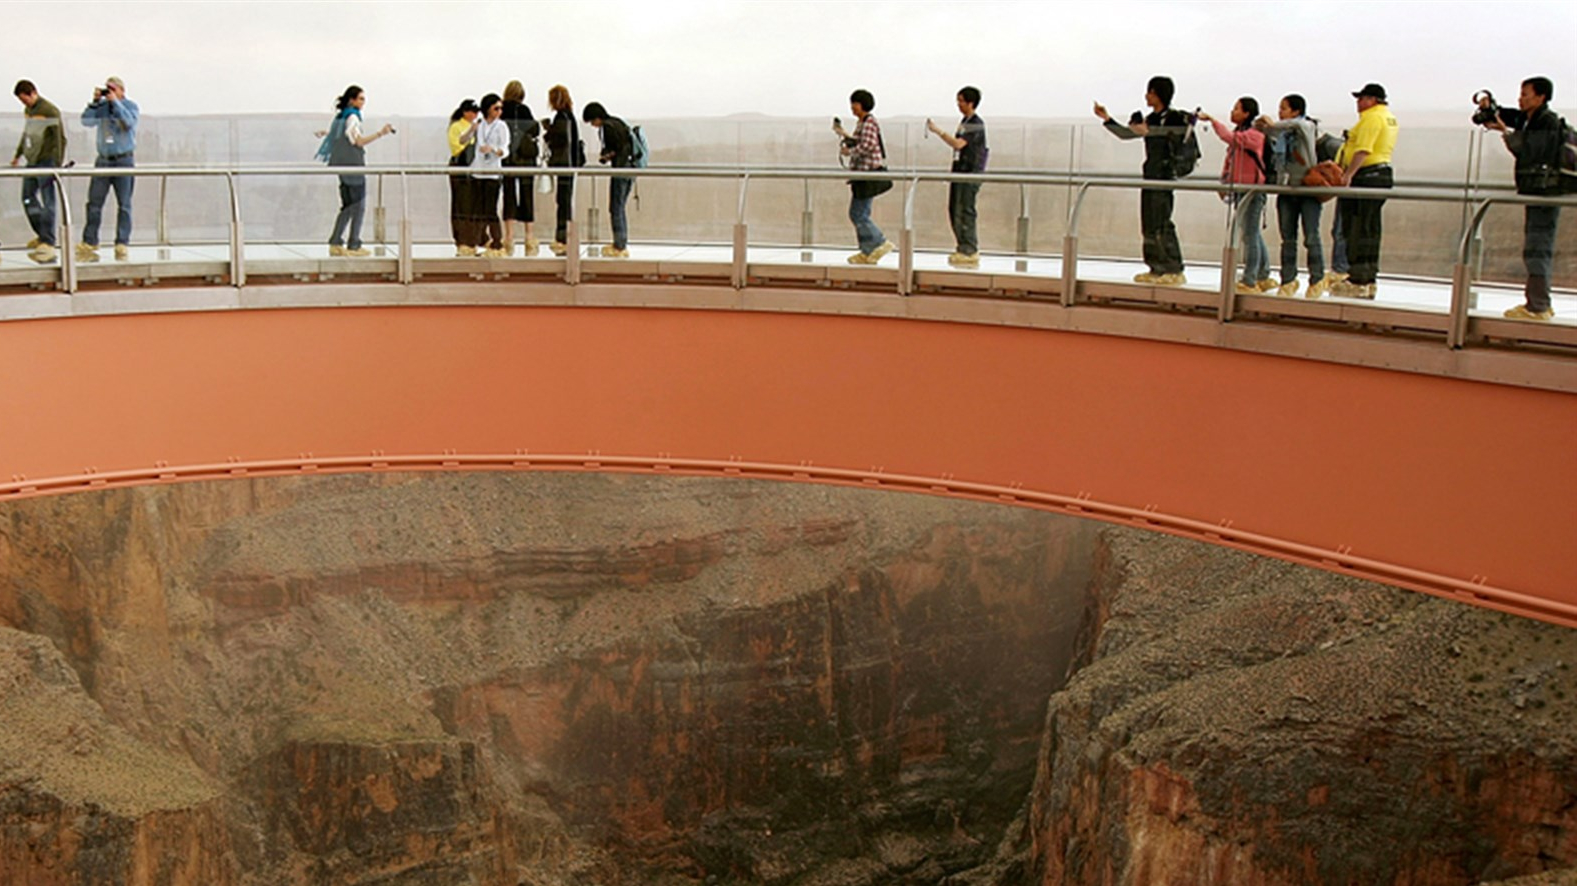 190329-grand-canyon-tourists-skywalk-walkway-2007-ac-503p_b9182709659f37e768489f368defd690.fit-2000w_1553987840985.jpg